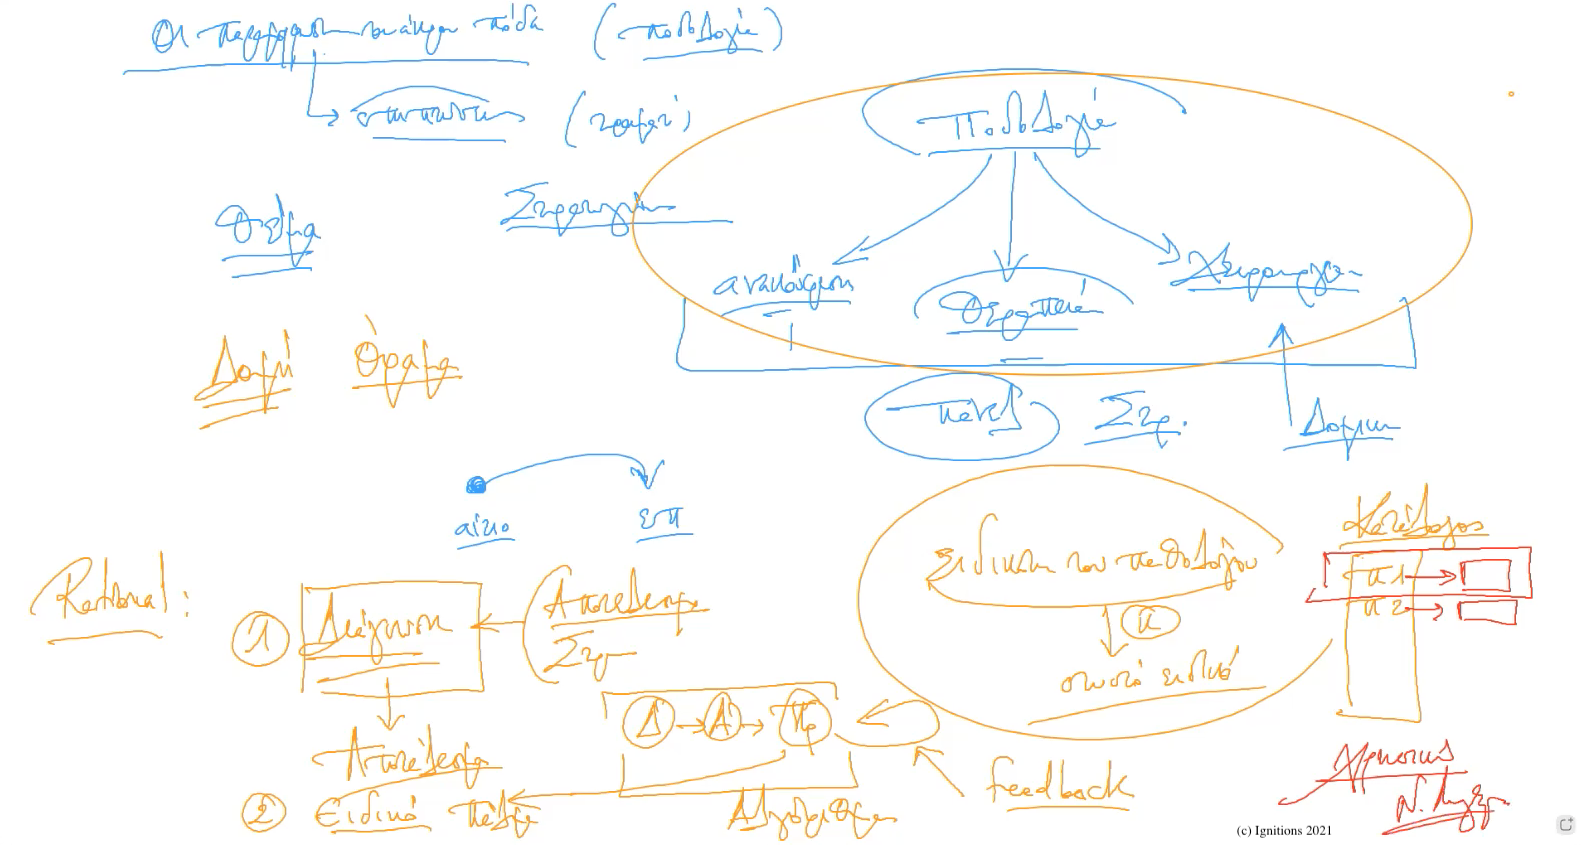 60214 - e-Μάθημα Ι: Σρατηγική δομή εργασίας. (Dessin)